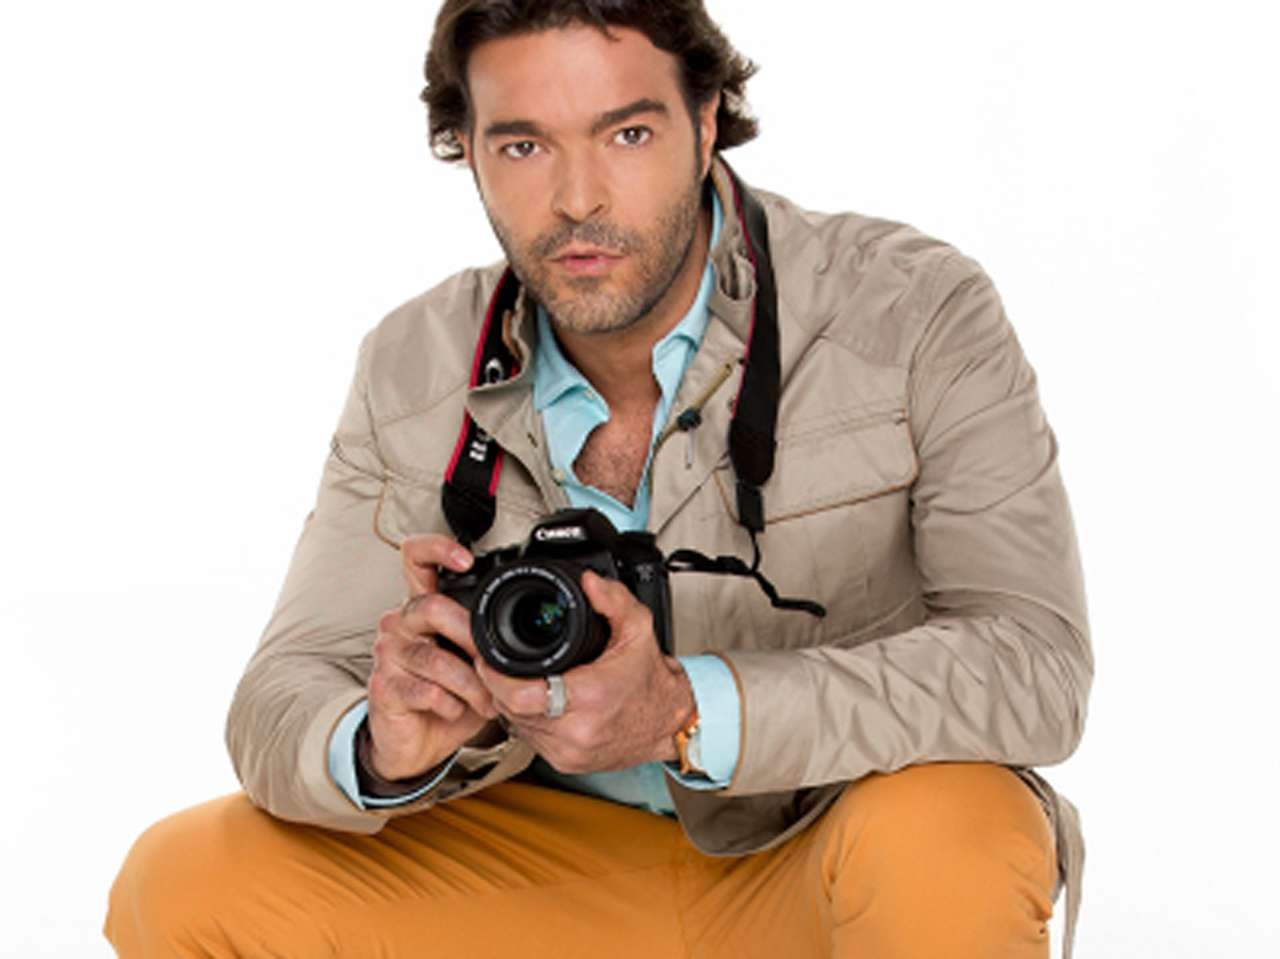 Pablo Montero Foto: Televisa